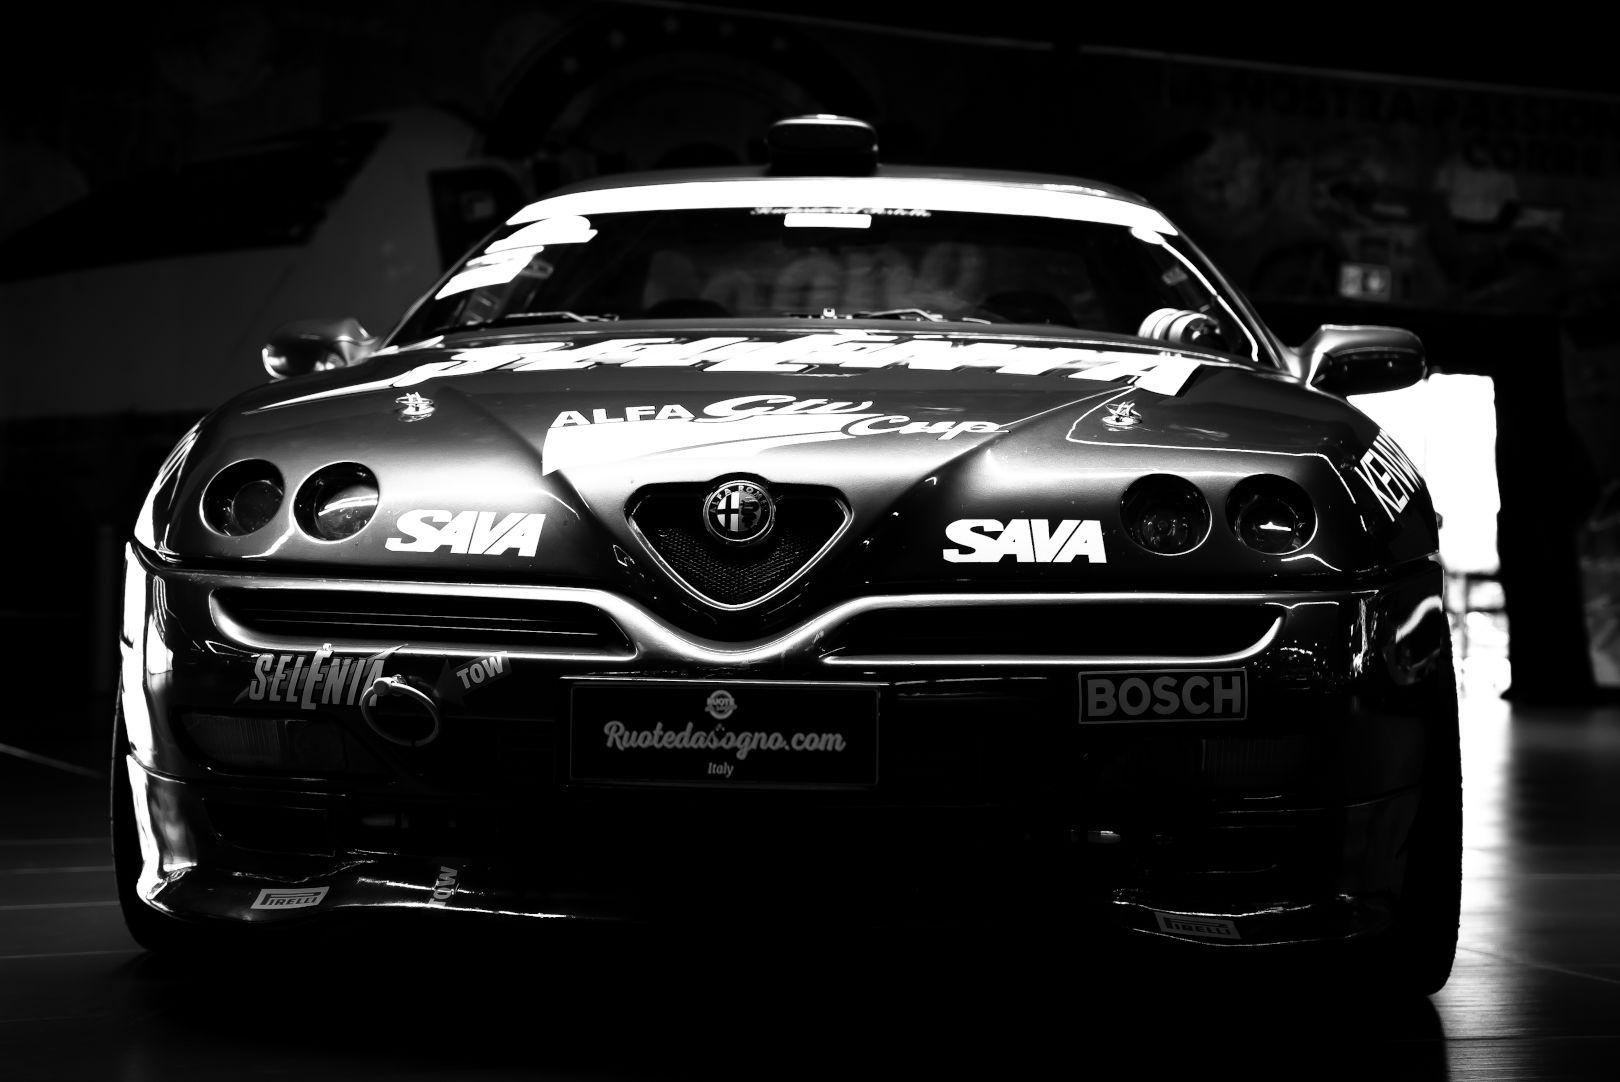 1995 Alfa Romeo GTV 2.0 V6 Turbo Cup Replica 57189